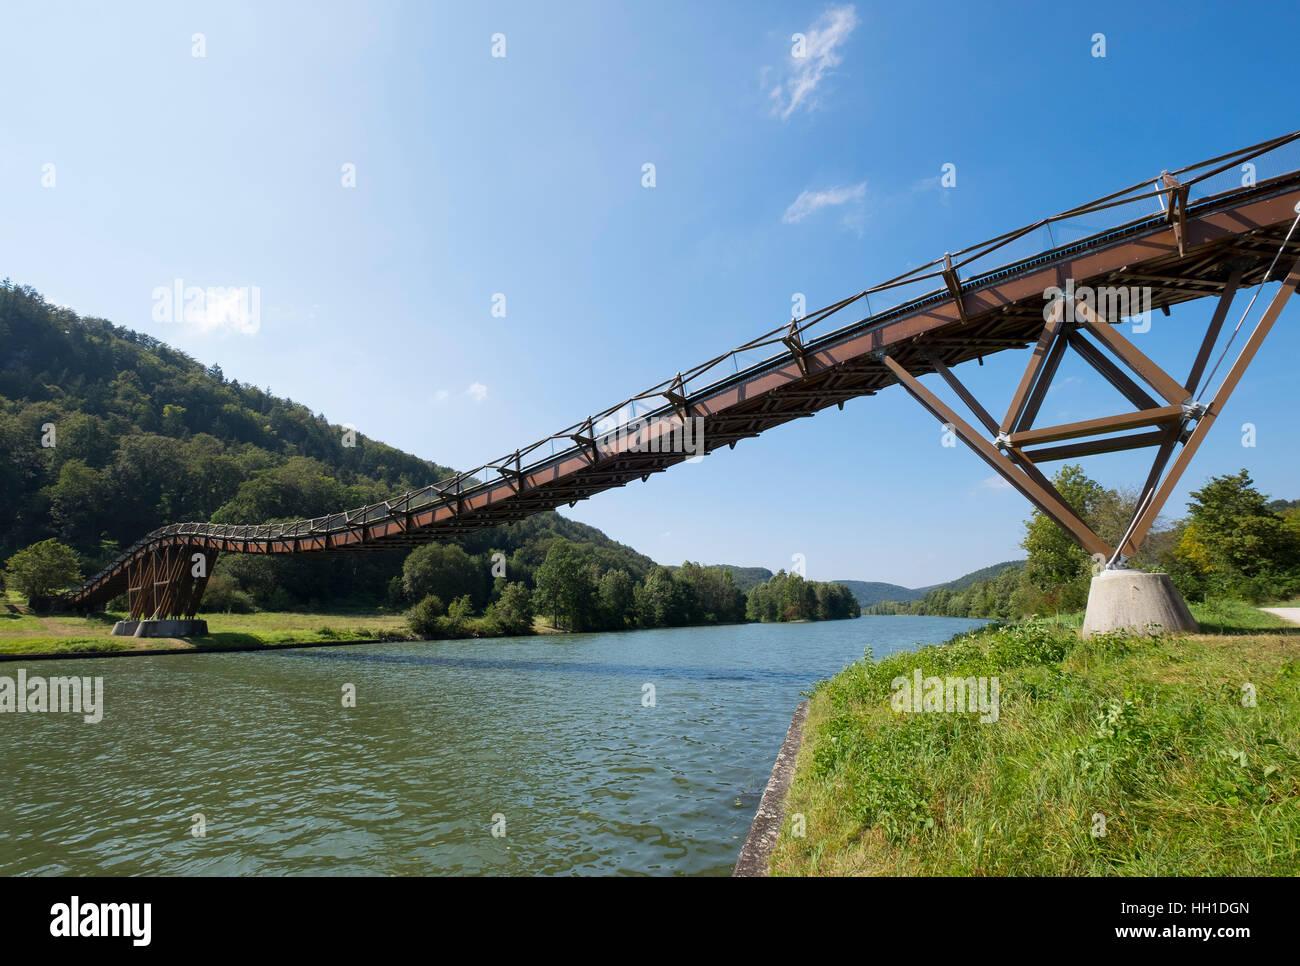 Stressed ribbon bridge, wooden bridge over Tatzlwurm Altmühl Canal, Essing, Altmühltal, Lower Bavaria, - Stock Image